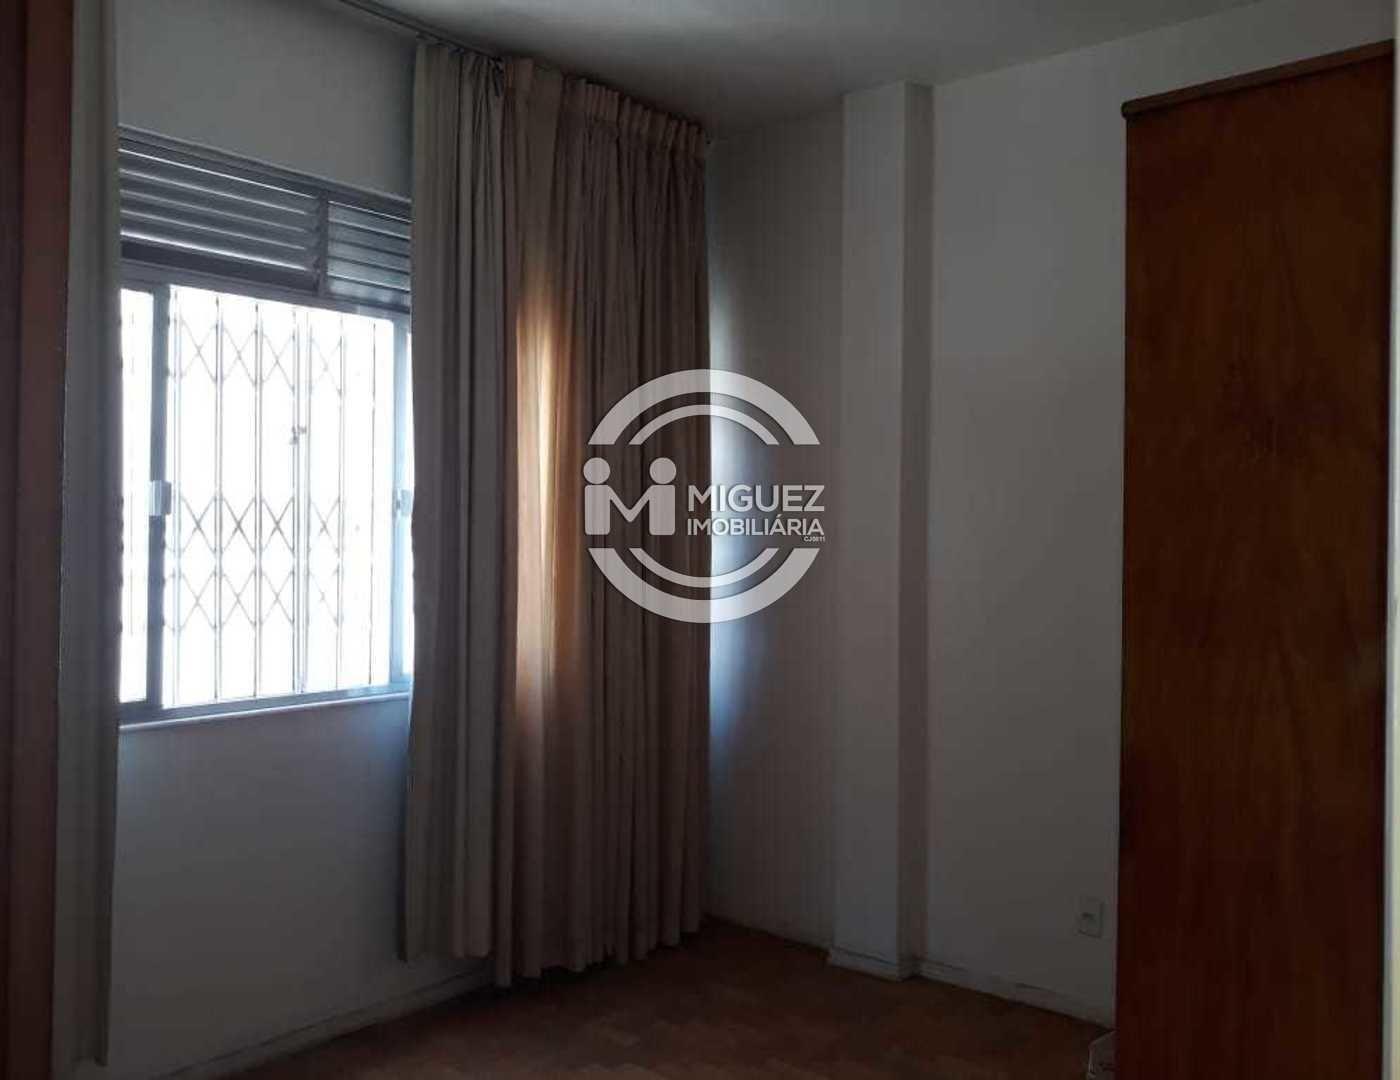 Apartamento, venda, Rua Visconde de Figueiredo - Tijuca , Rio de janeiro